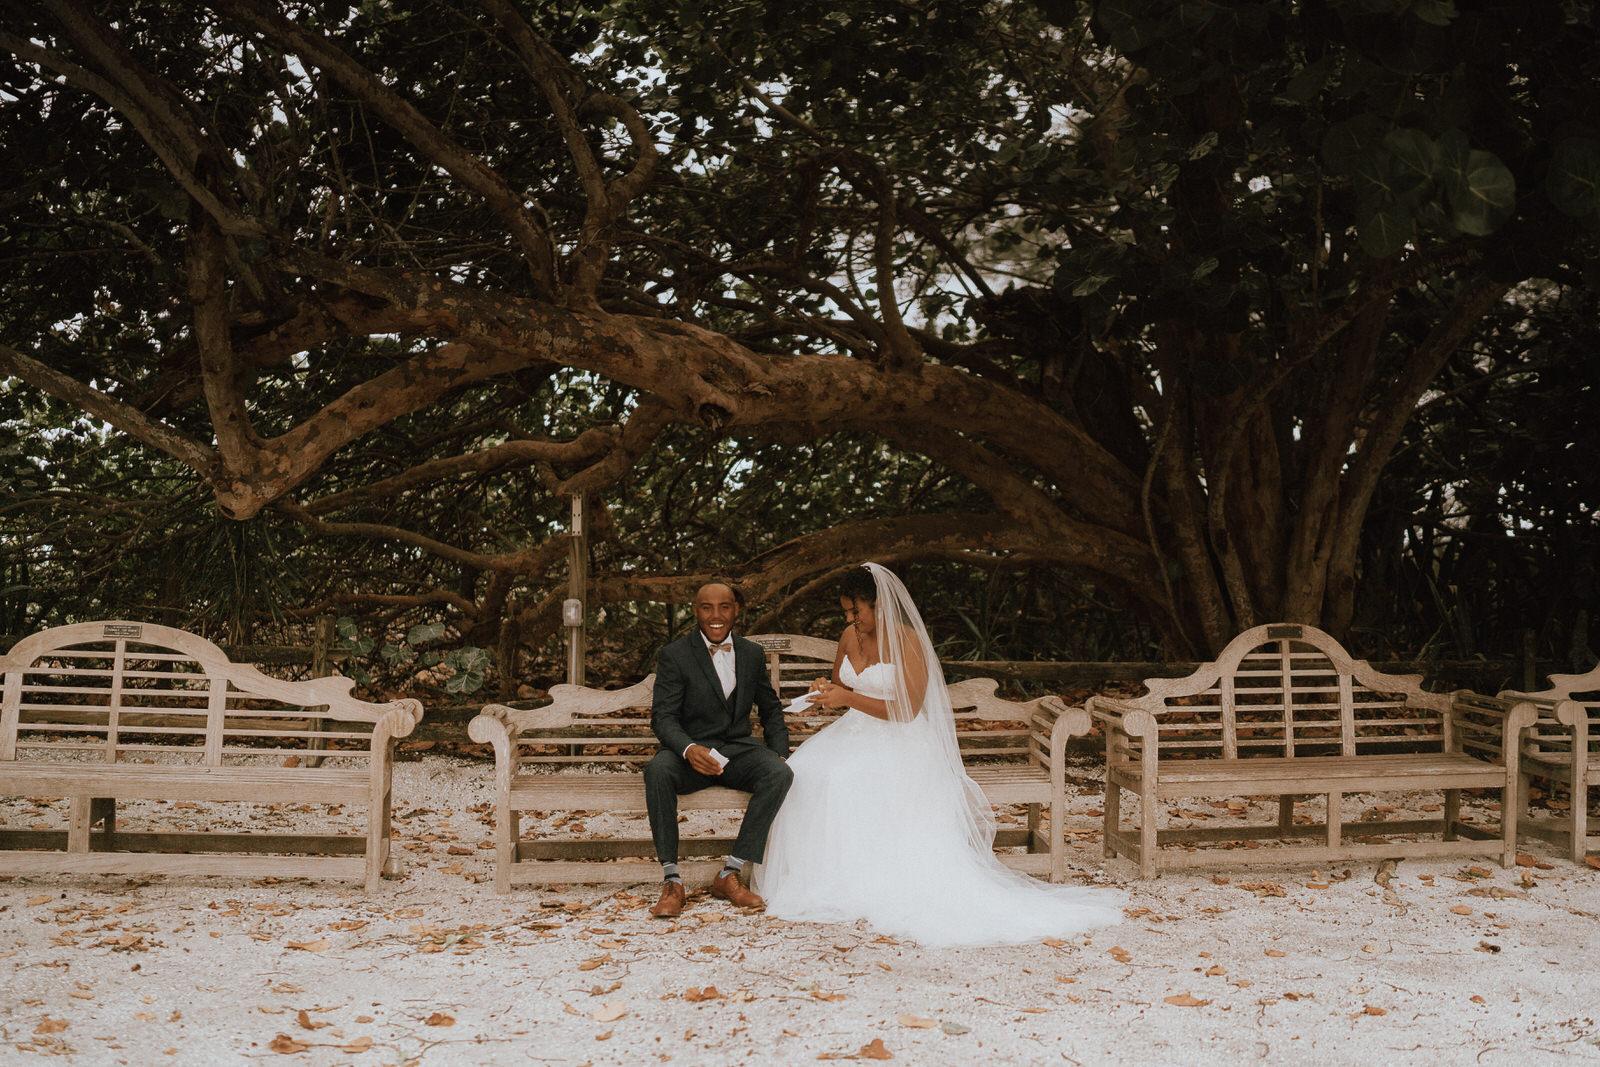 South Seas Island Resort Elopement- Alyana and Shawn- Michelle Gonzalez Photography-197.JPG